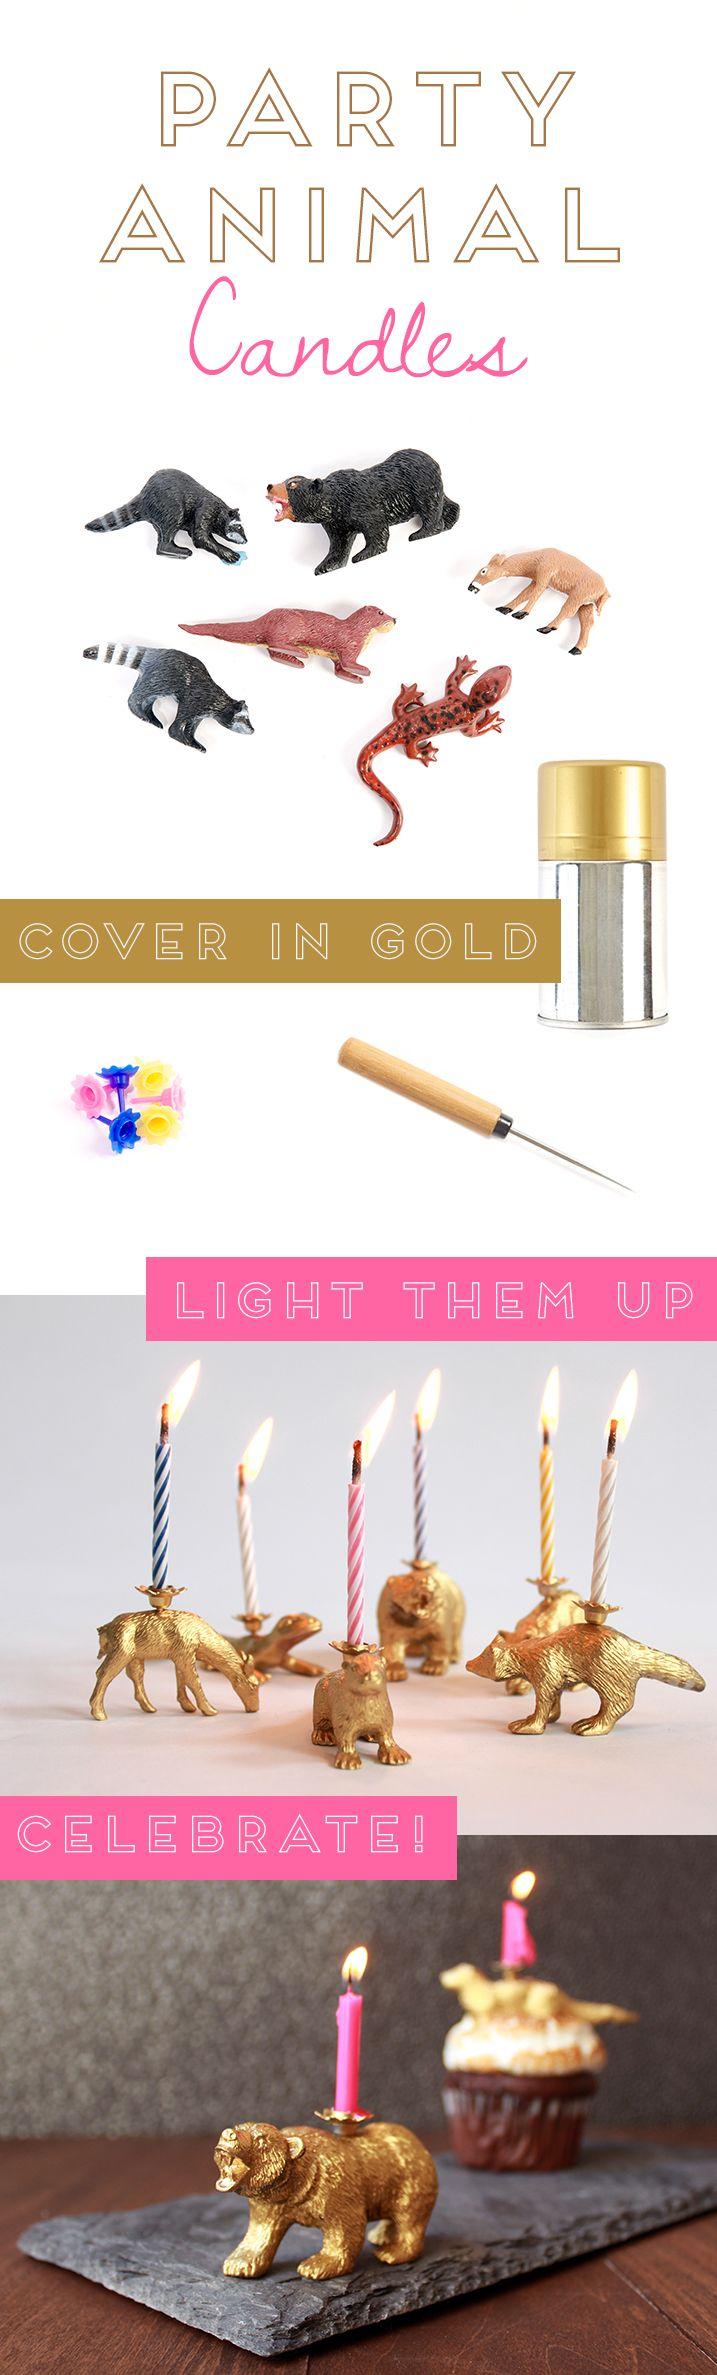 DIY Party Animal Candles Kit